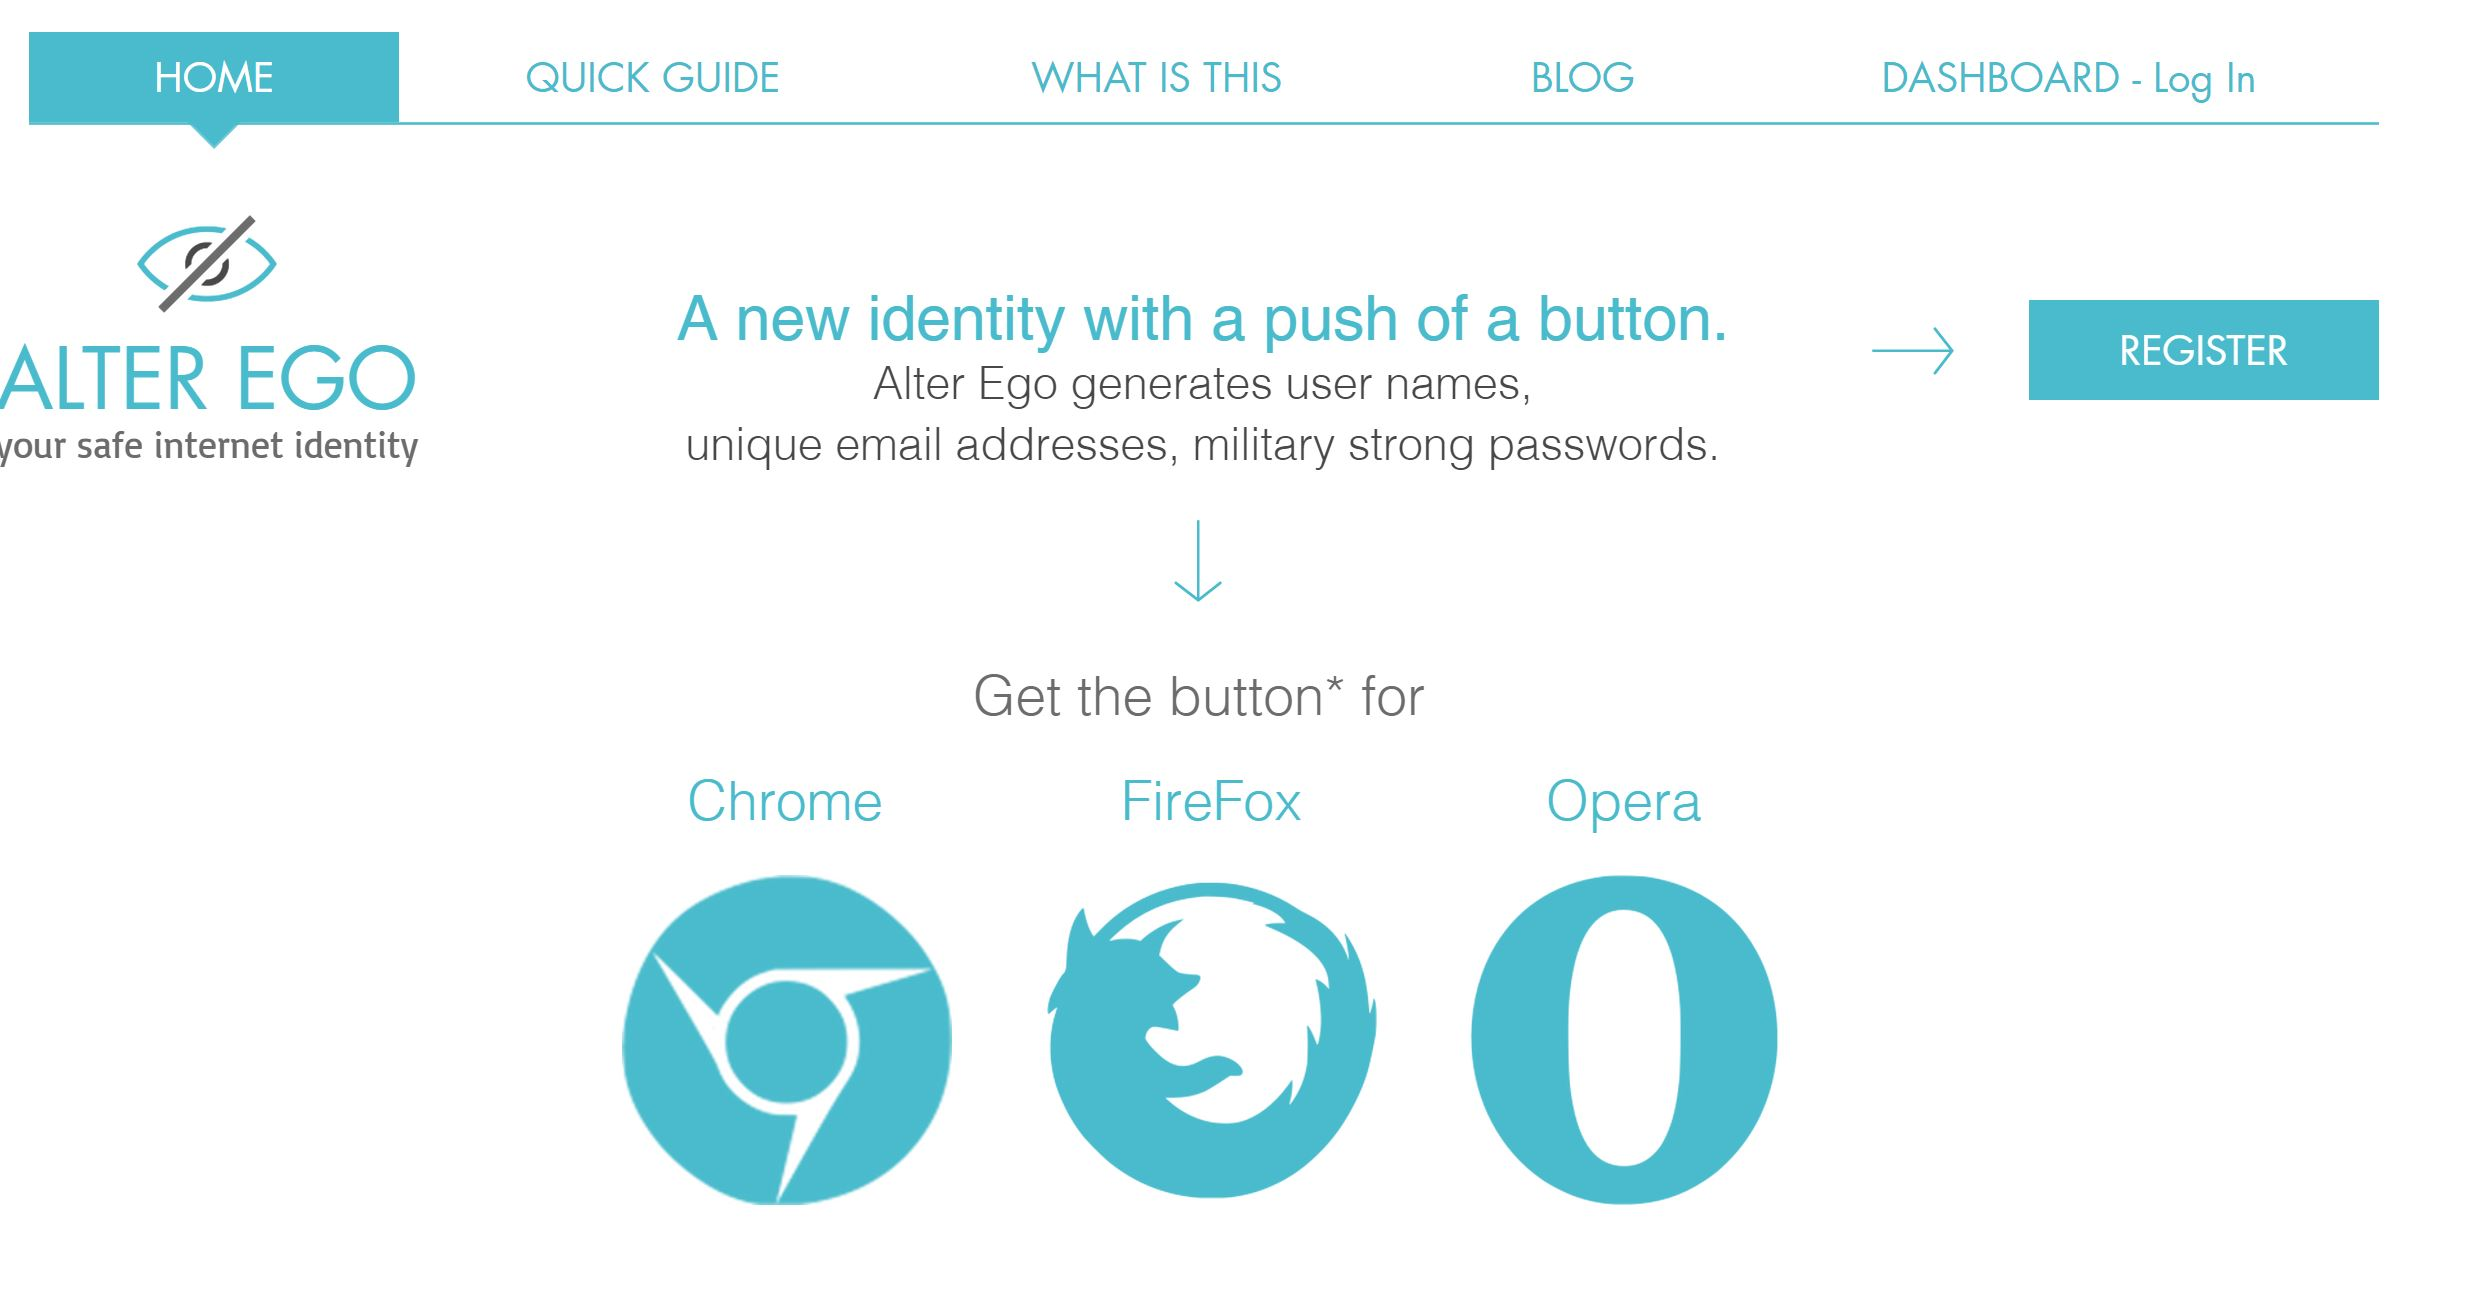 cyber alter ego ciprian bof cybersecurity securitatea datelor